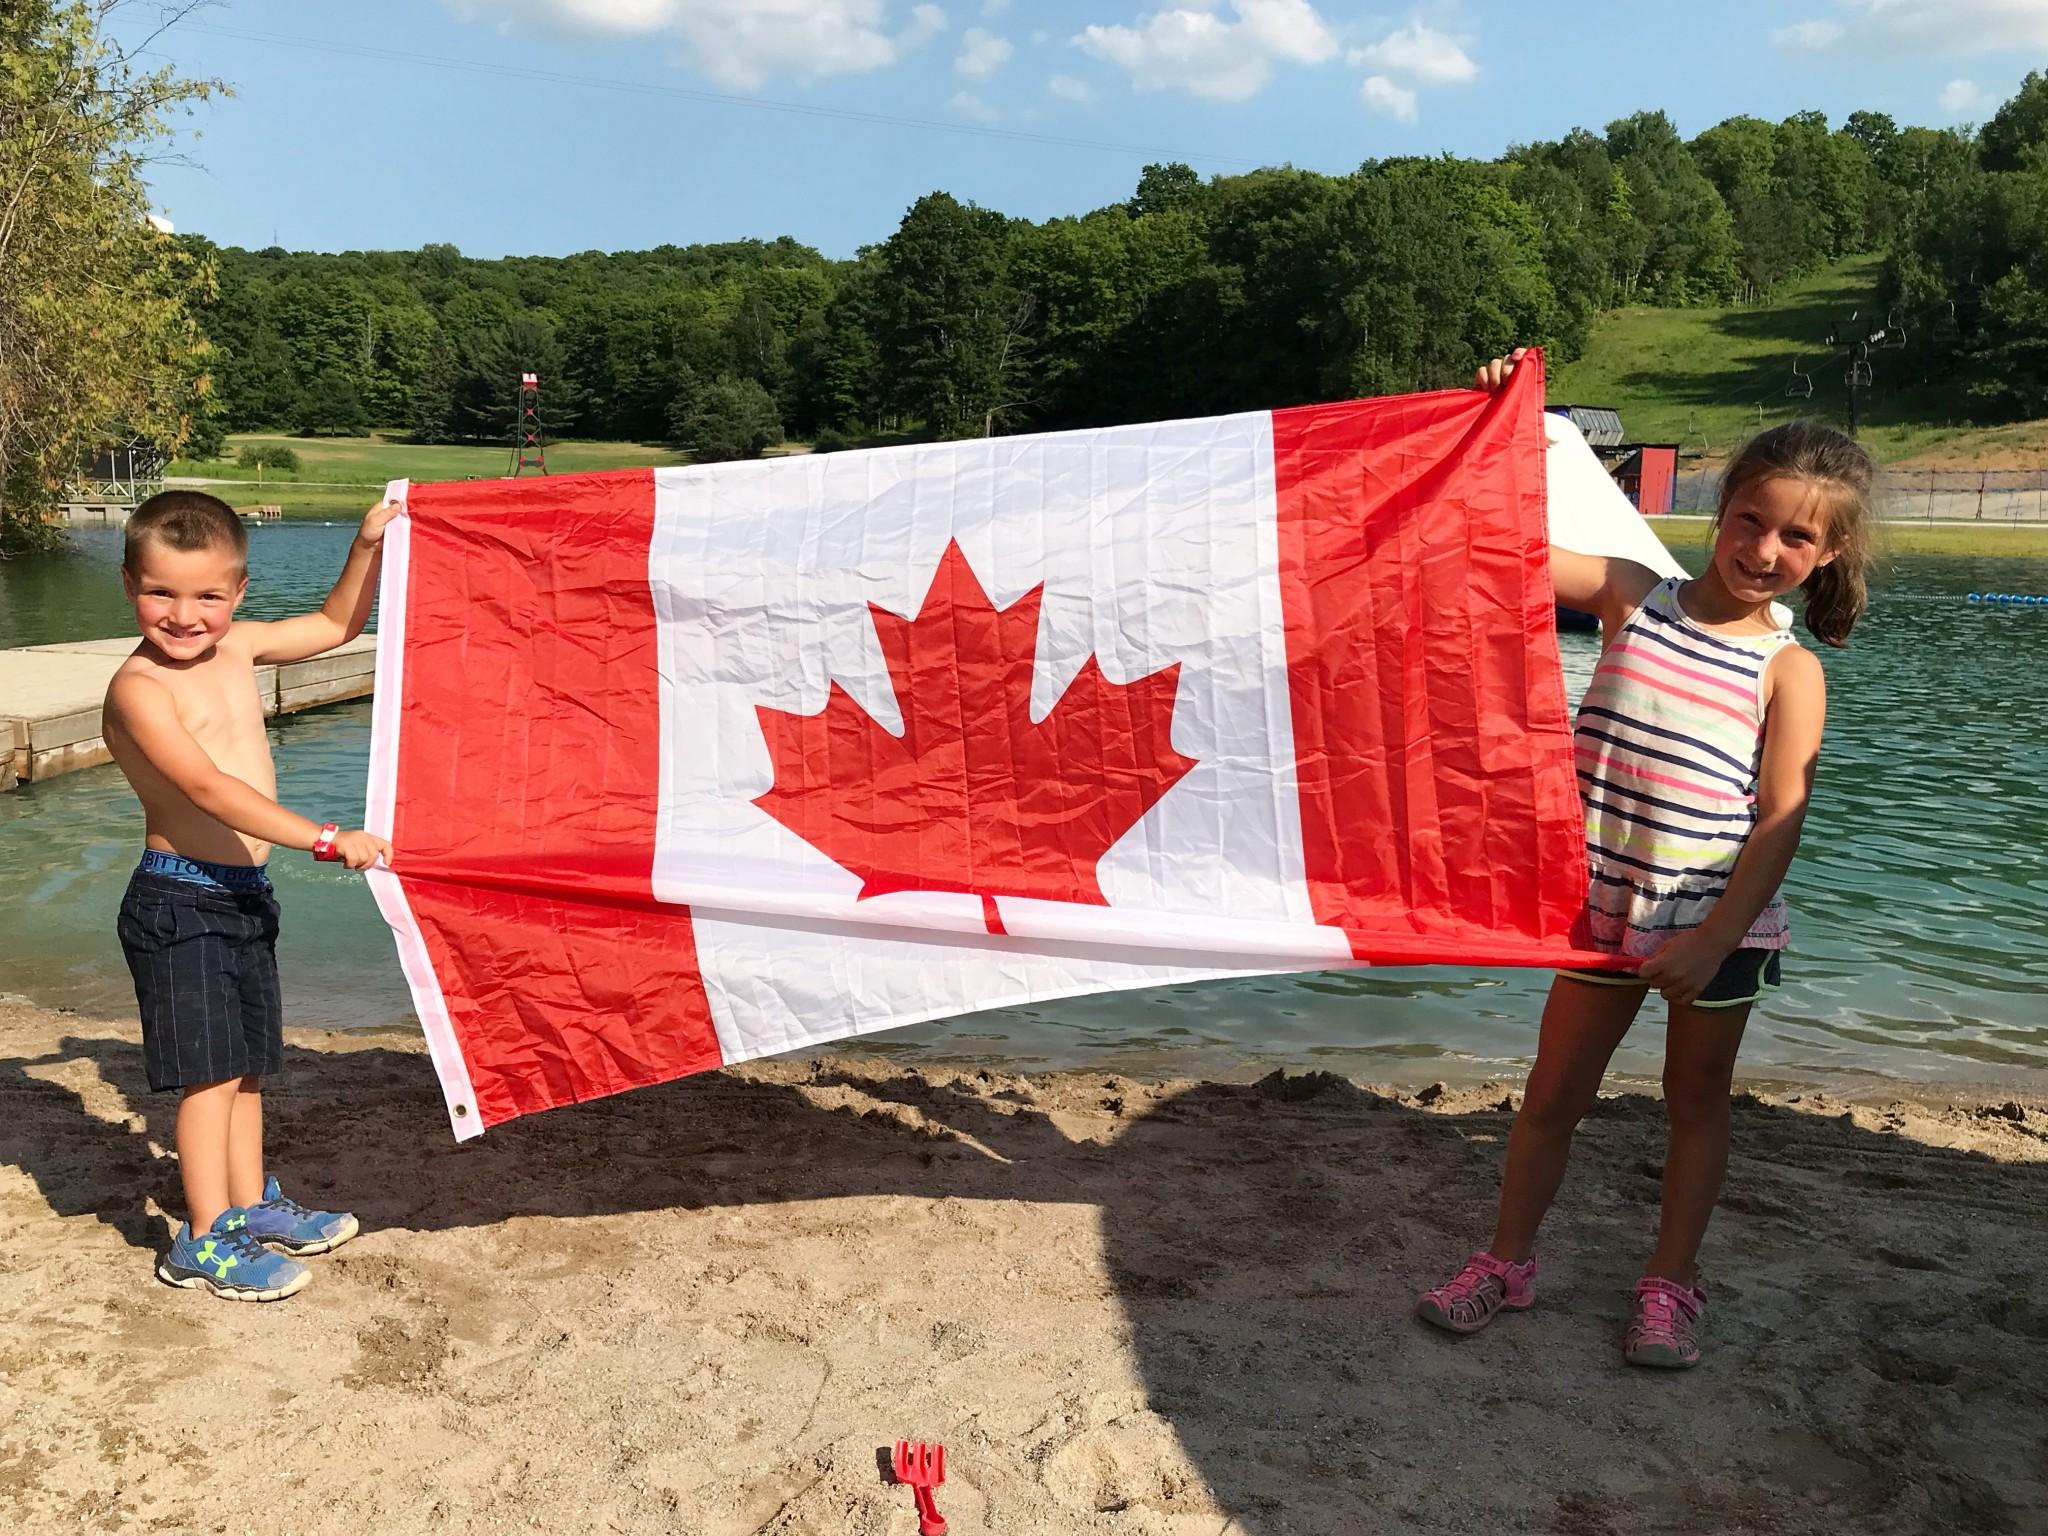 IMG 4104 - Canada Day @ Horseshoe Resort